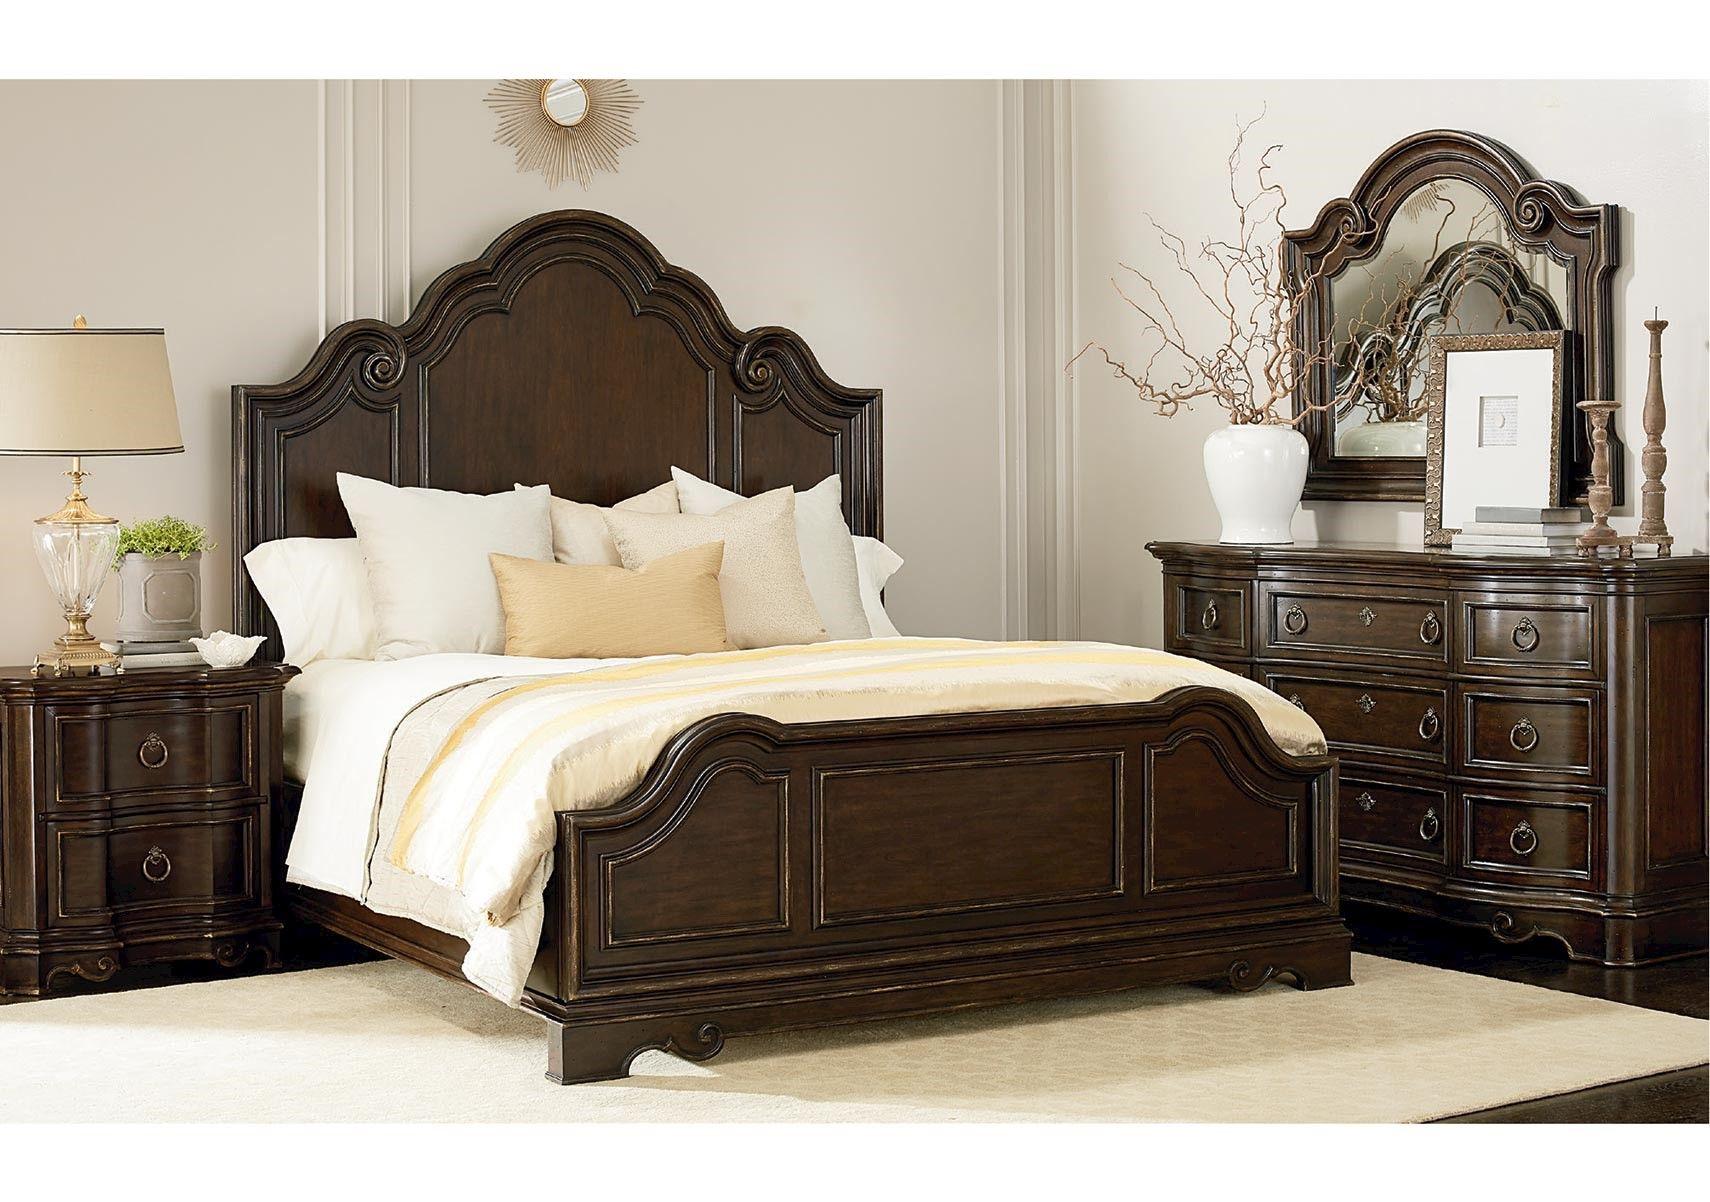 Lacks Bella 4 Pc Queen Bedroom Set Bedroom Set Discount Bedroom Furniture Sets Bedroom Decor For Couples